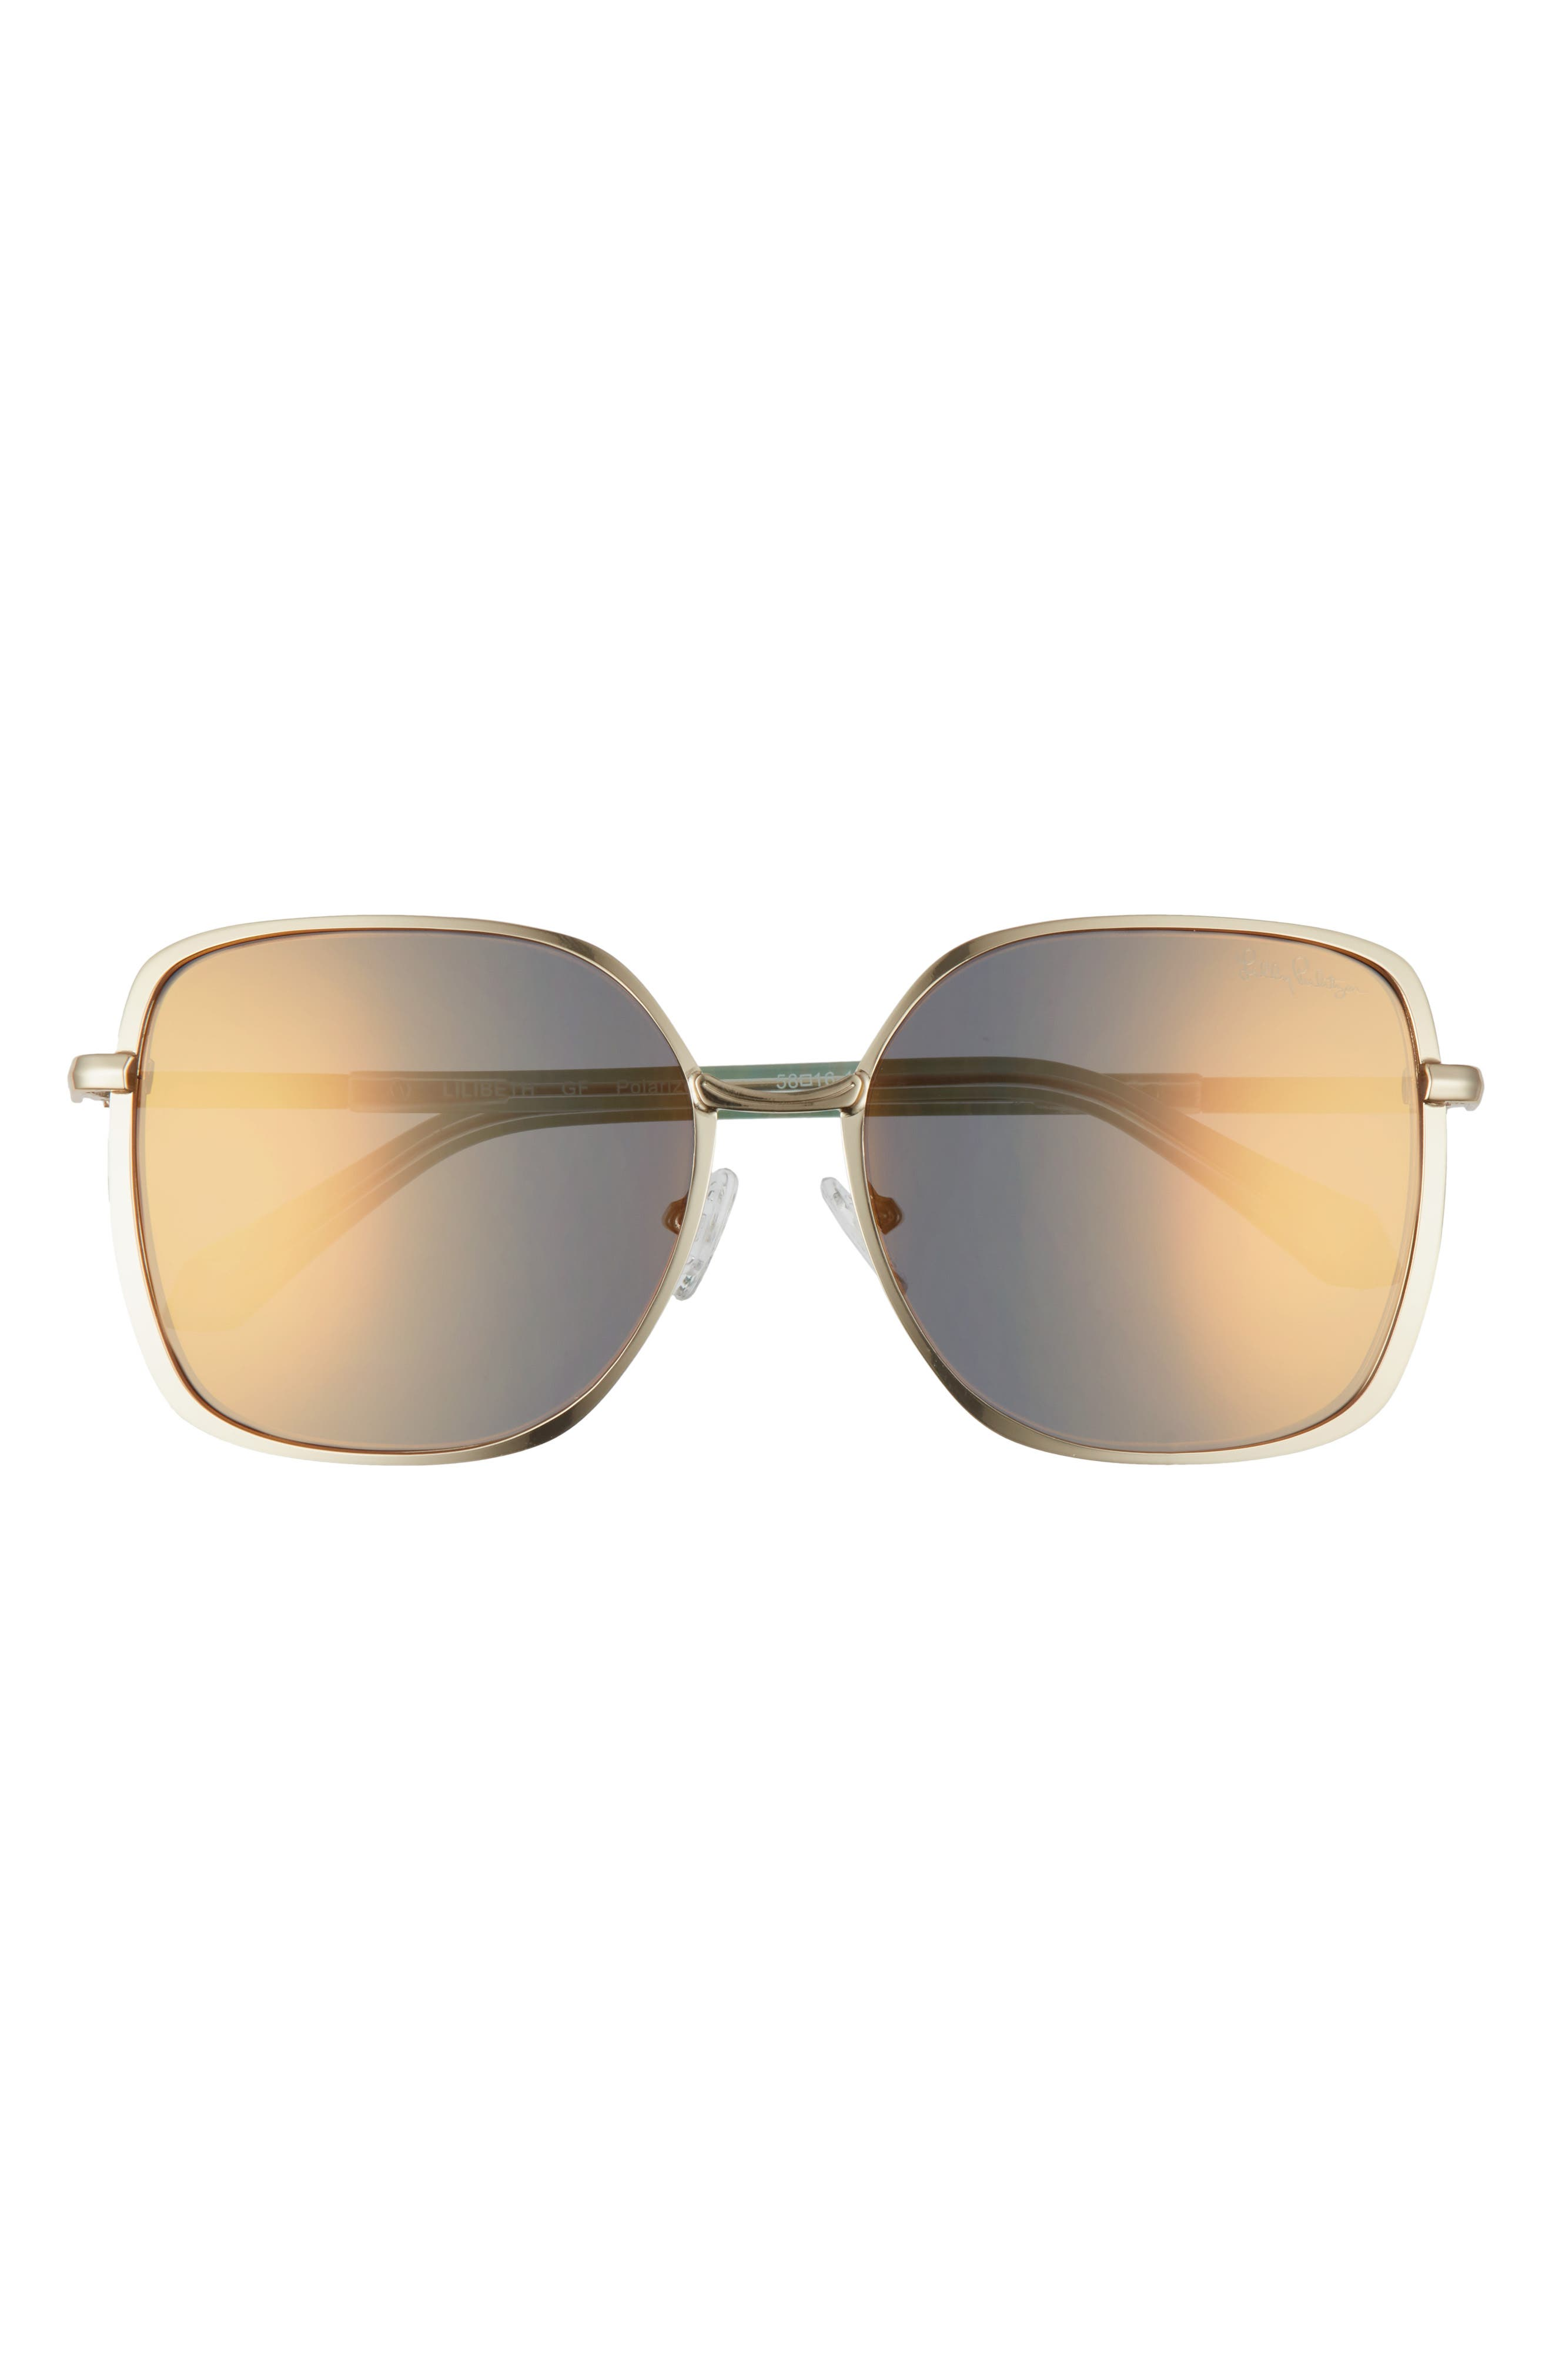 Women's Lilly Pulitzer Lilibeth 58mm Polarized Square Sunglasses